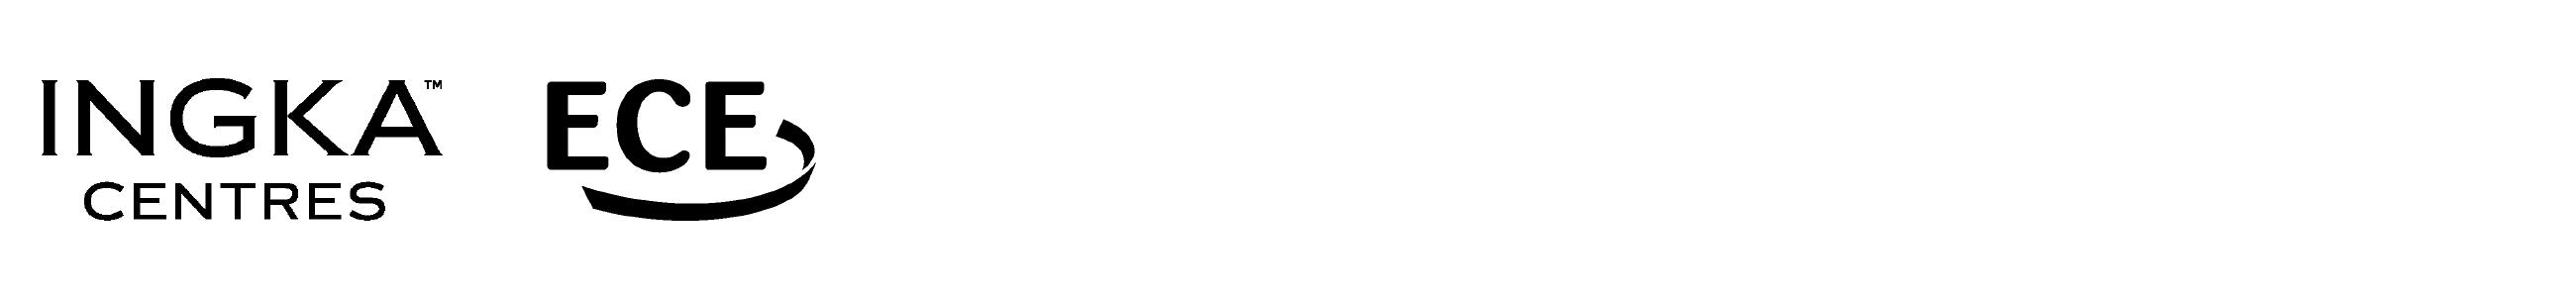 MADHOUSE_-_WEB_V2_LOS_PITUFOS_-_CLIENTES